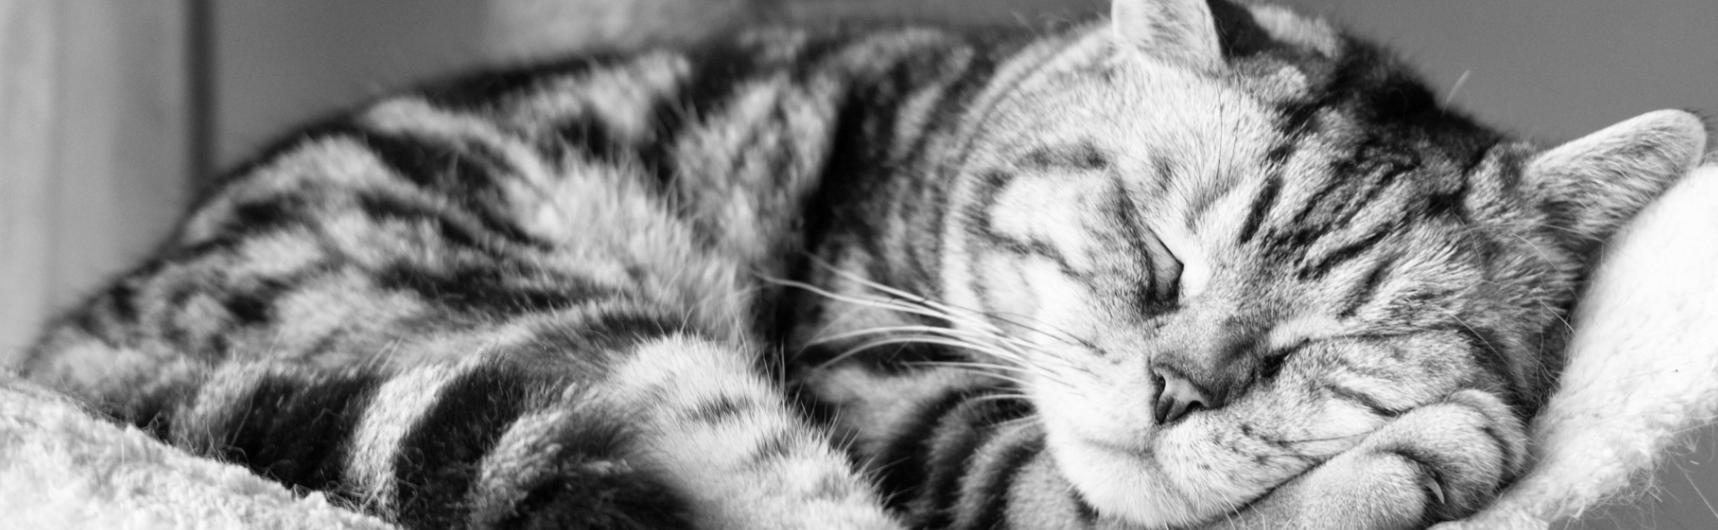 Anestesia Cani e Gatti Anziani